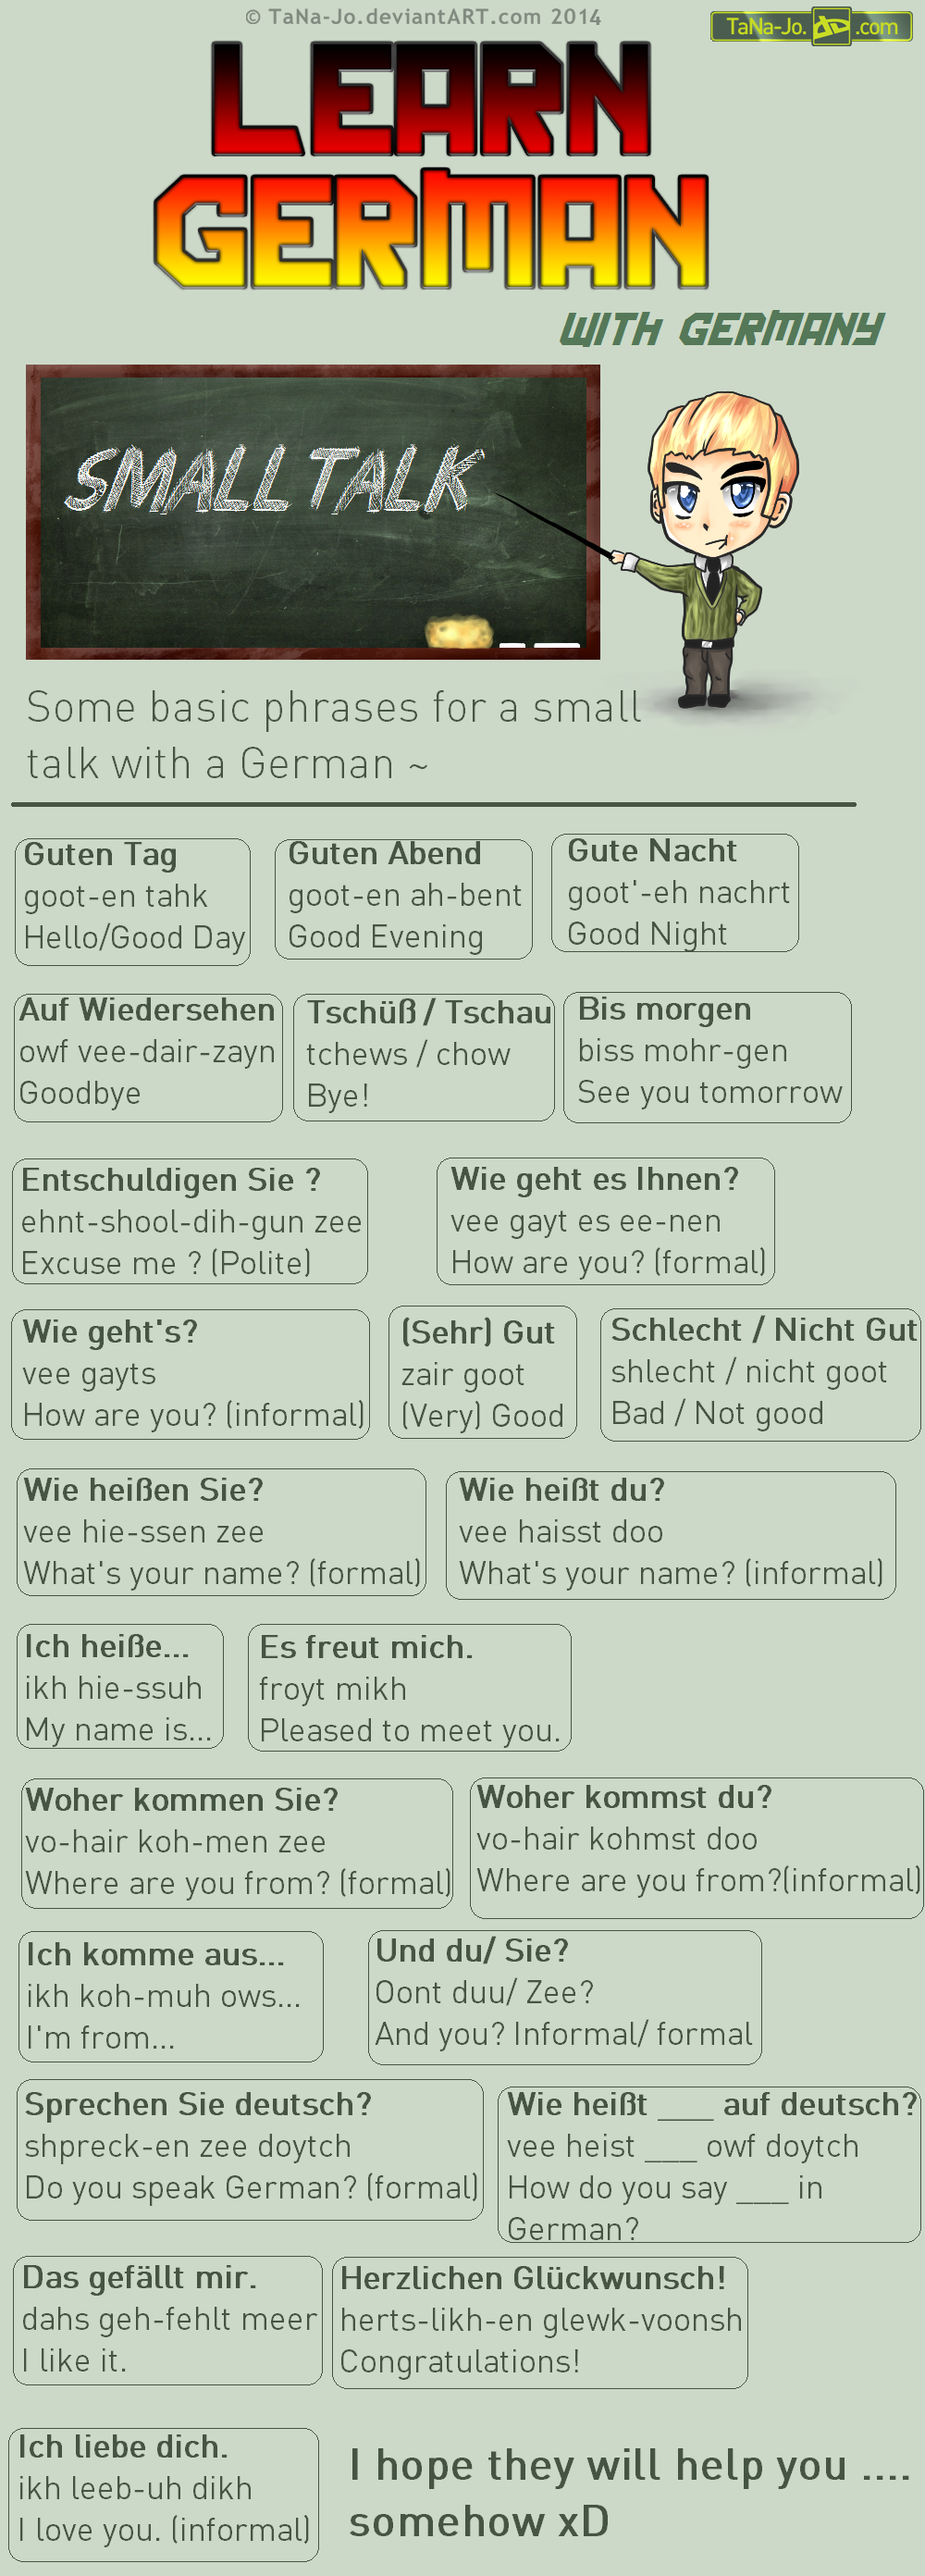 Learn German - Phrases - Talking by TaNa-Jo.deviantart.com on @DeviantArt